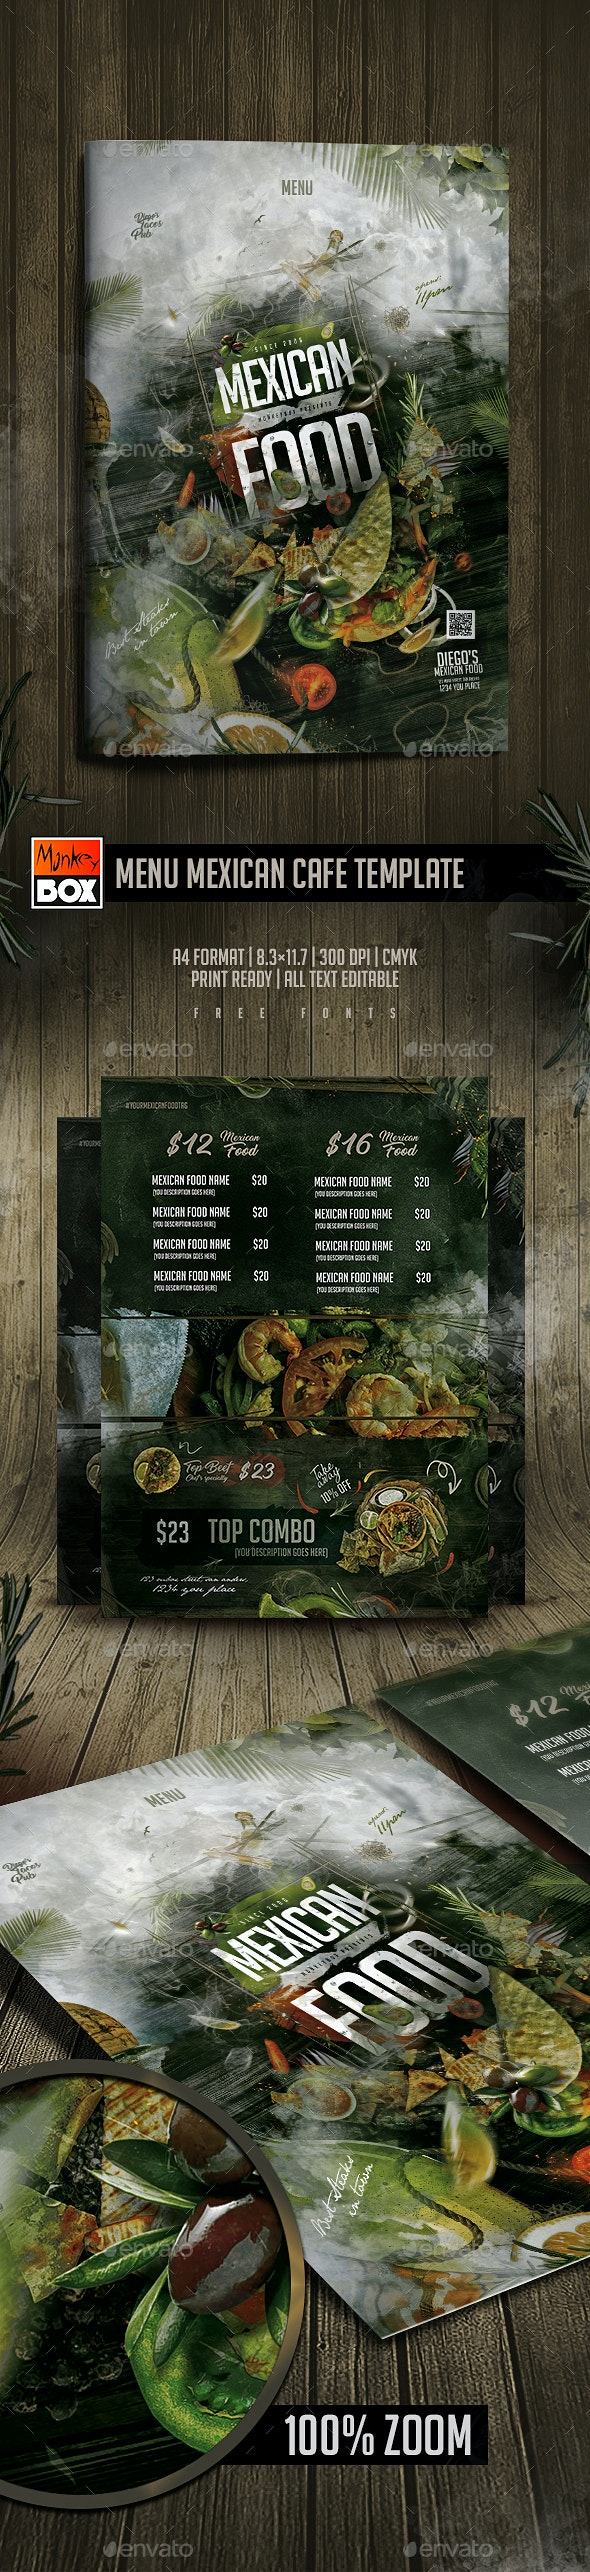 Menu Mexican Cafe Template - Food Menus Print Templates